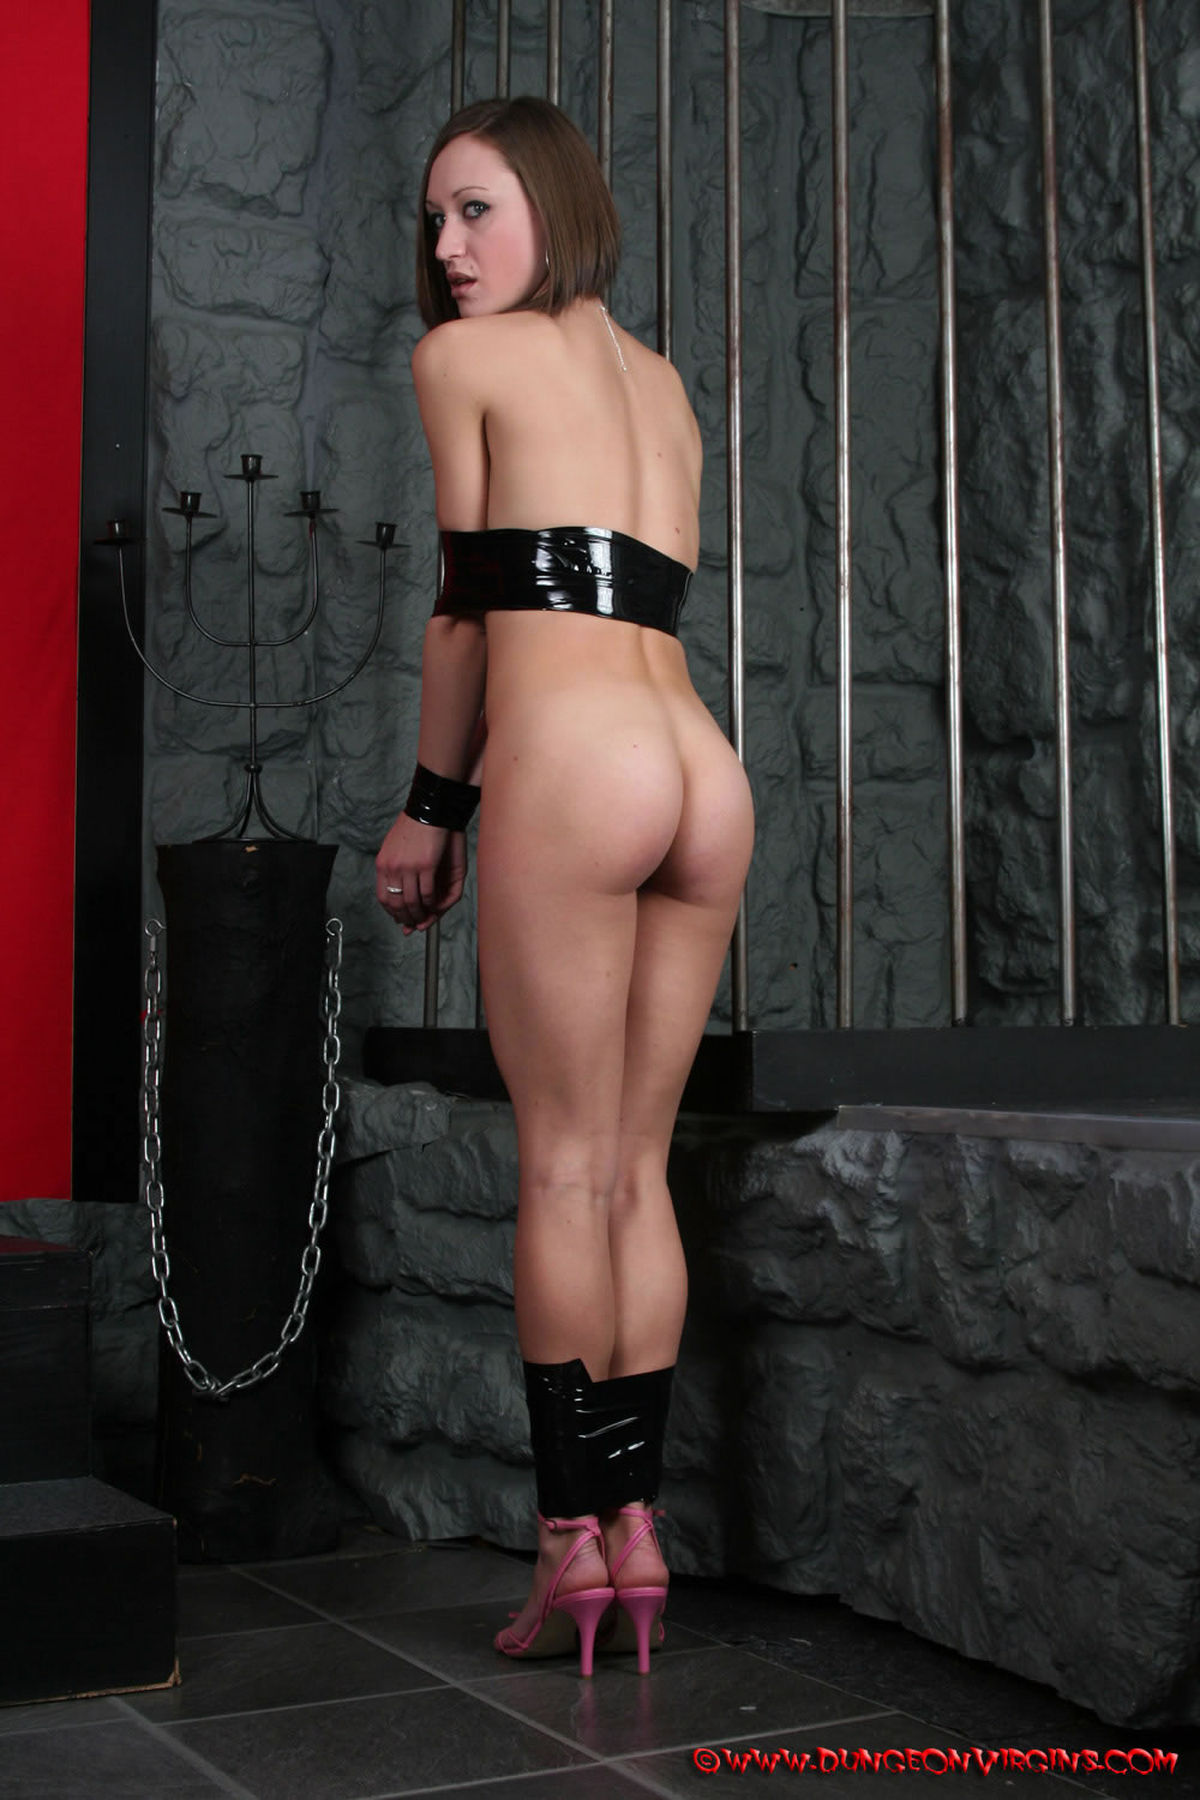 janet jackson sex video